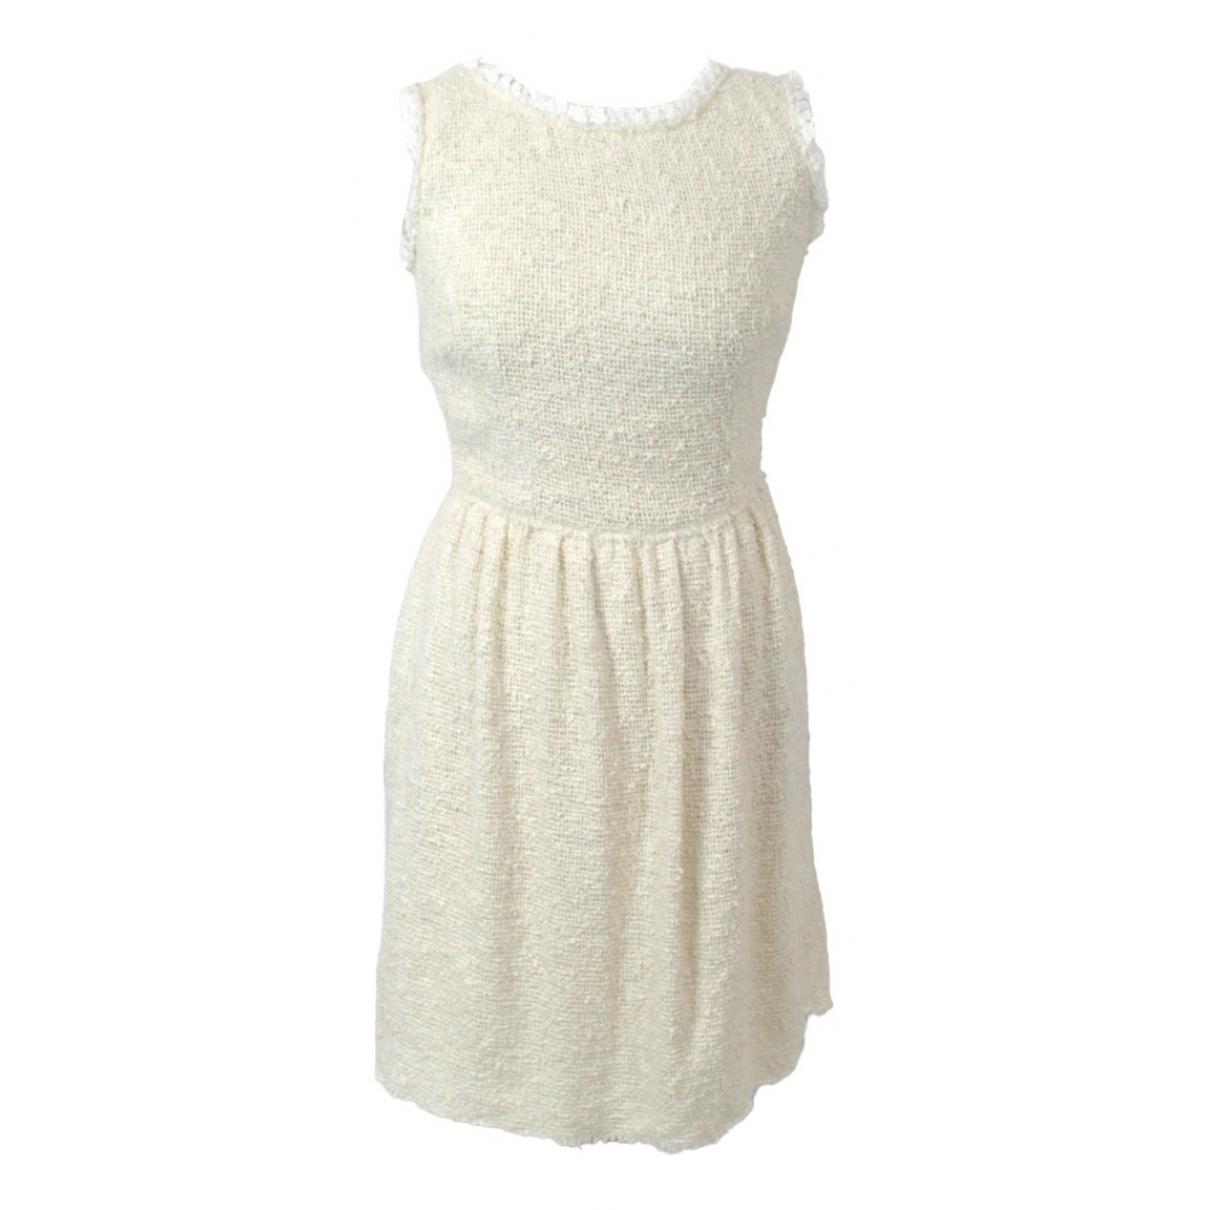 Dolce & Gabbana \N Kleid in  Ecru Baumwolle